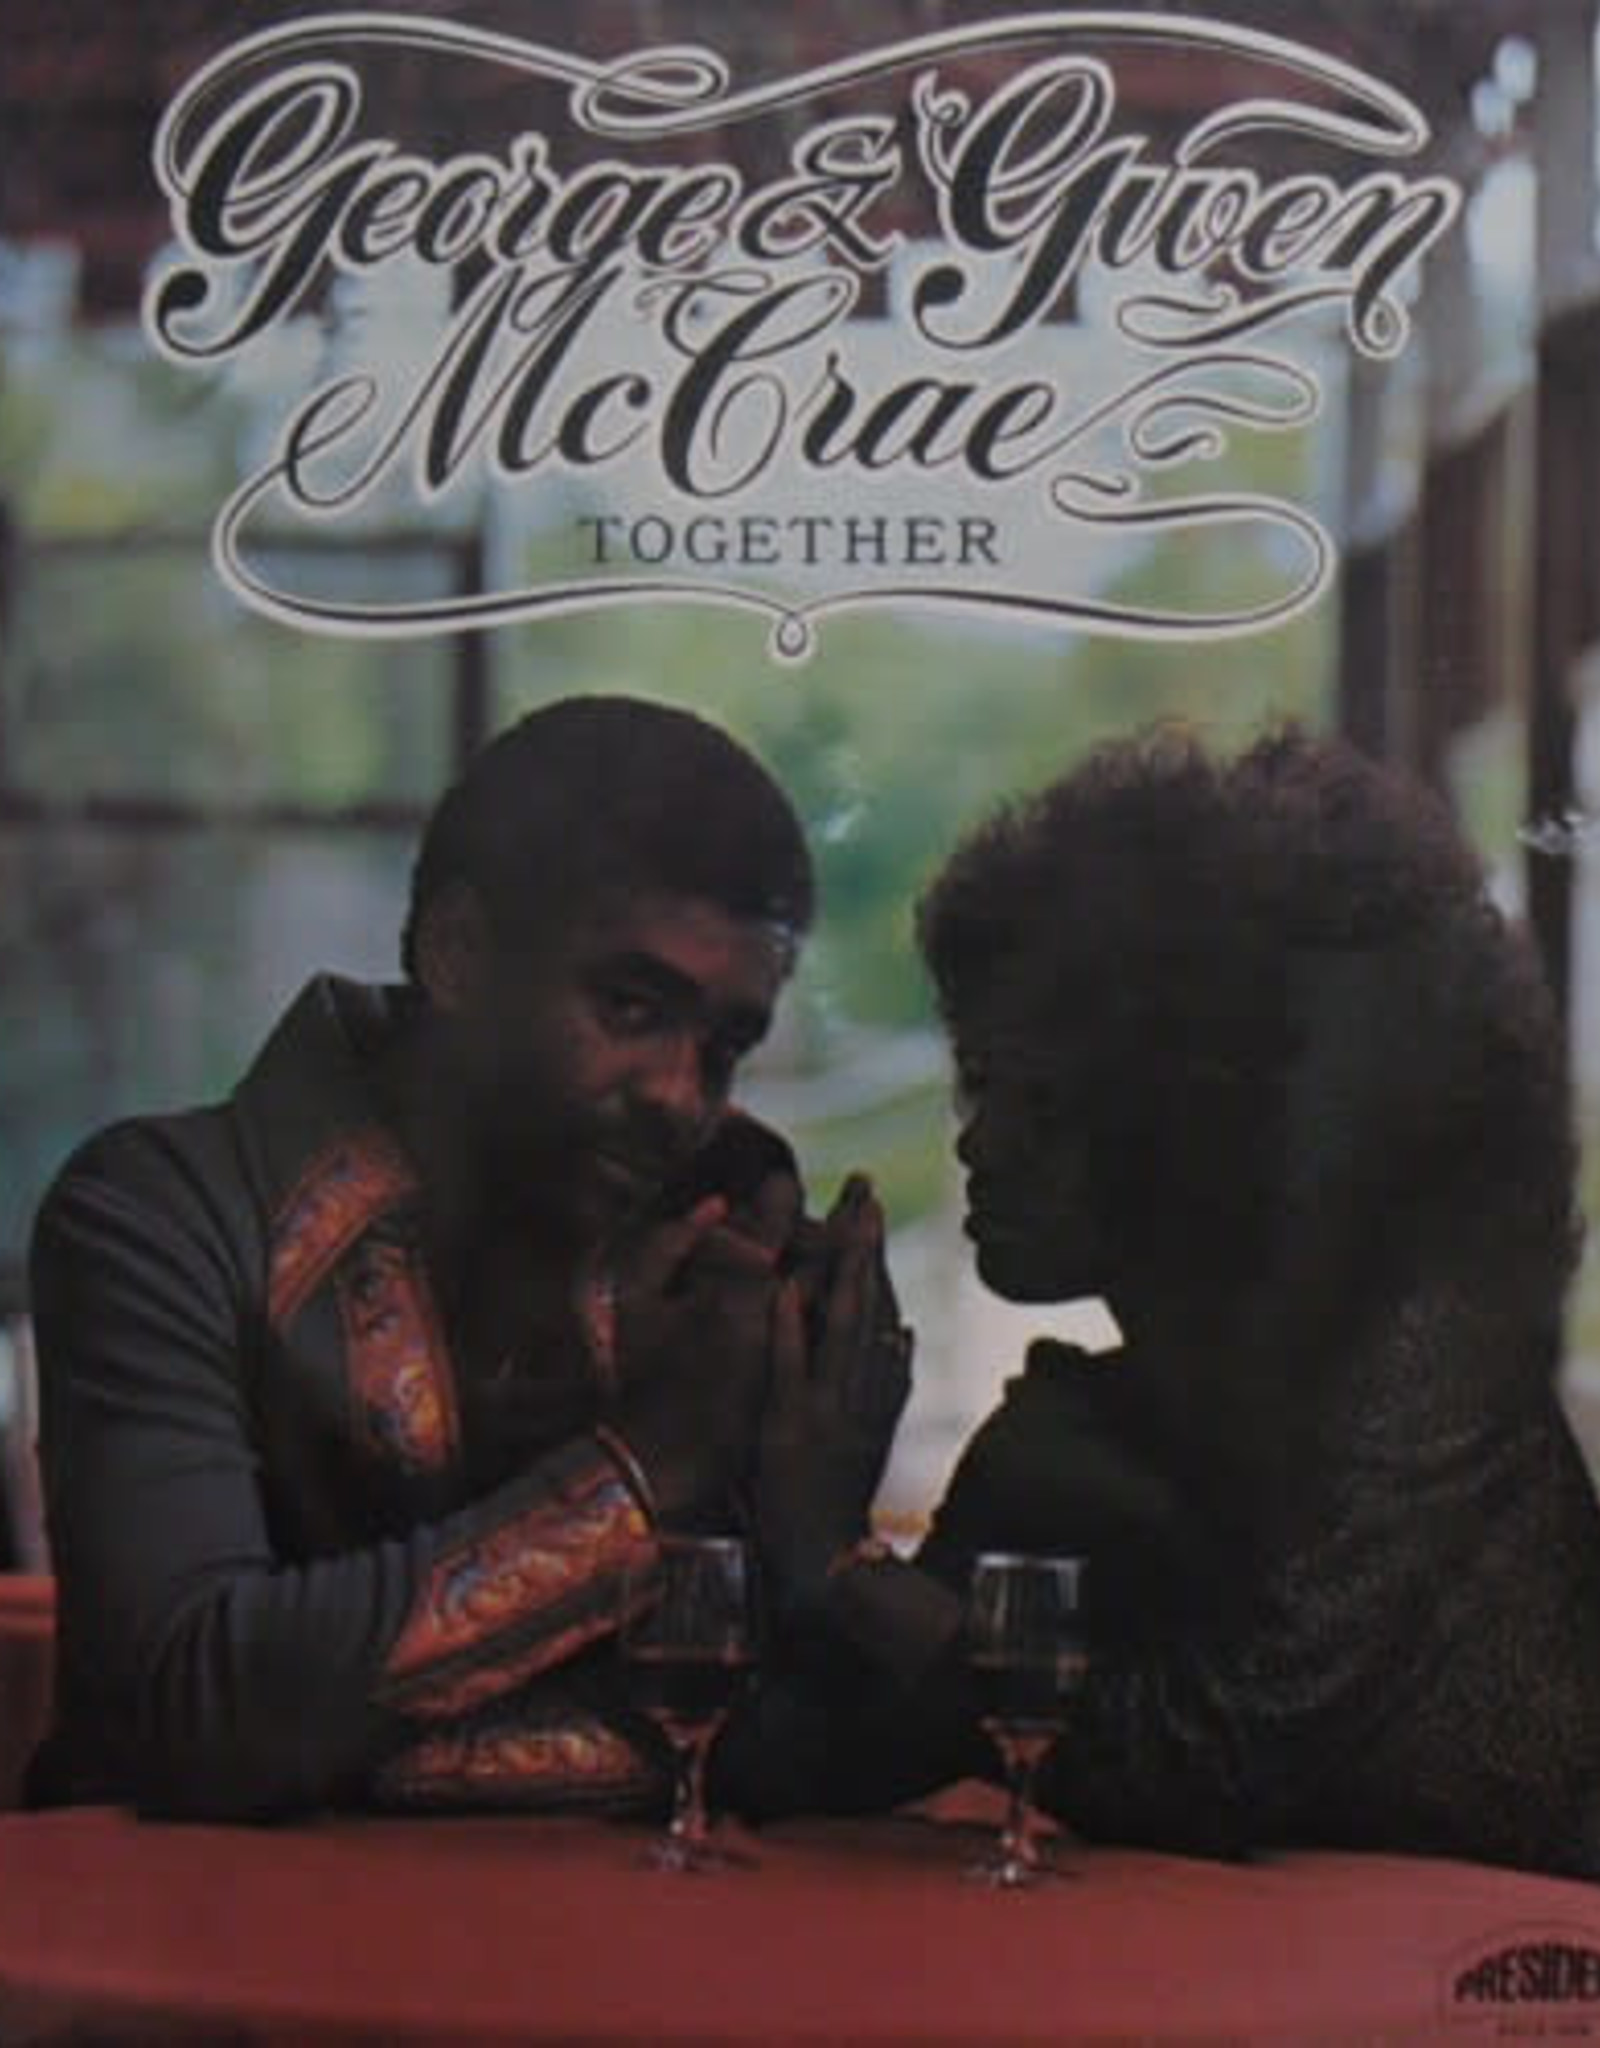 George & Gwen McRae - Together